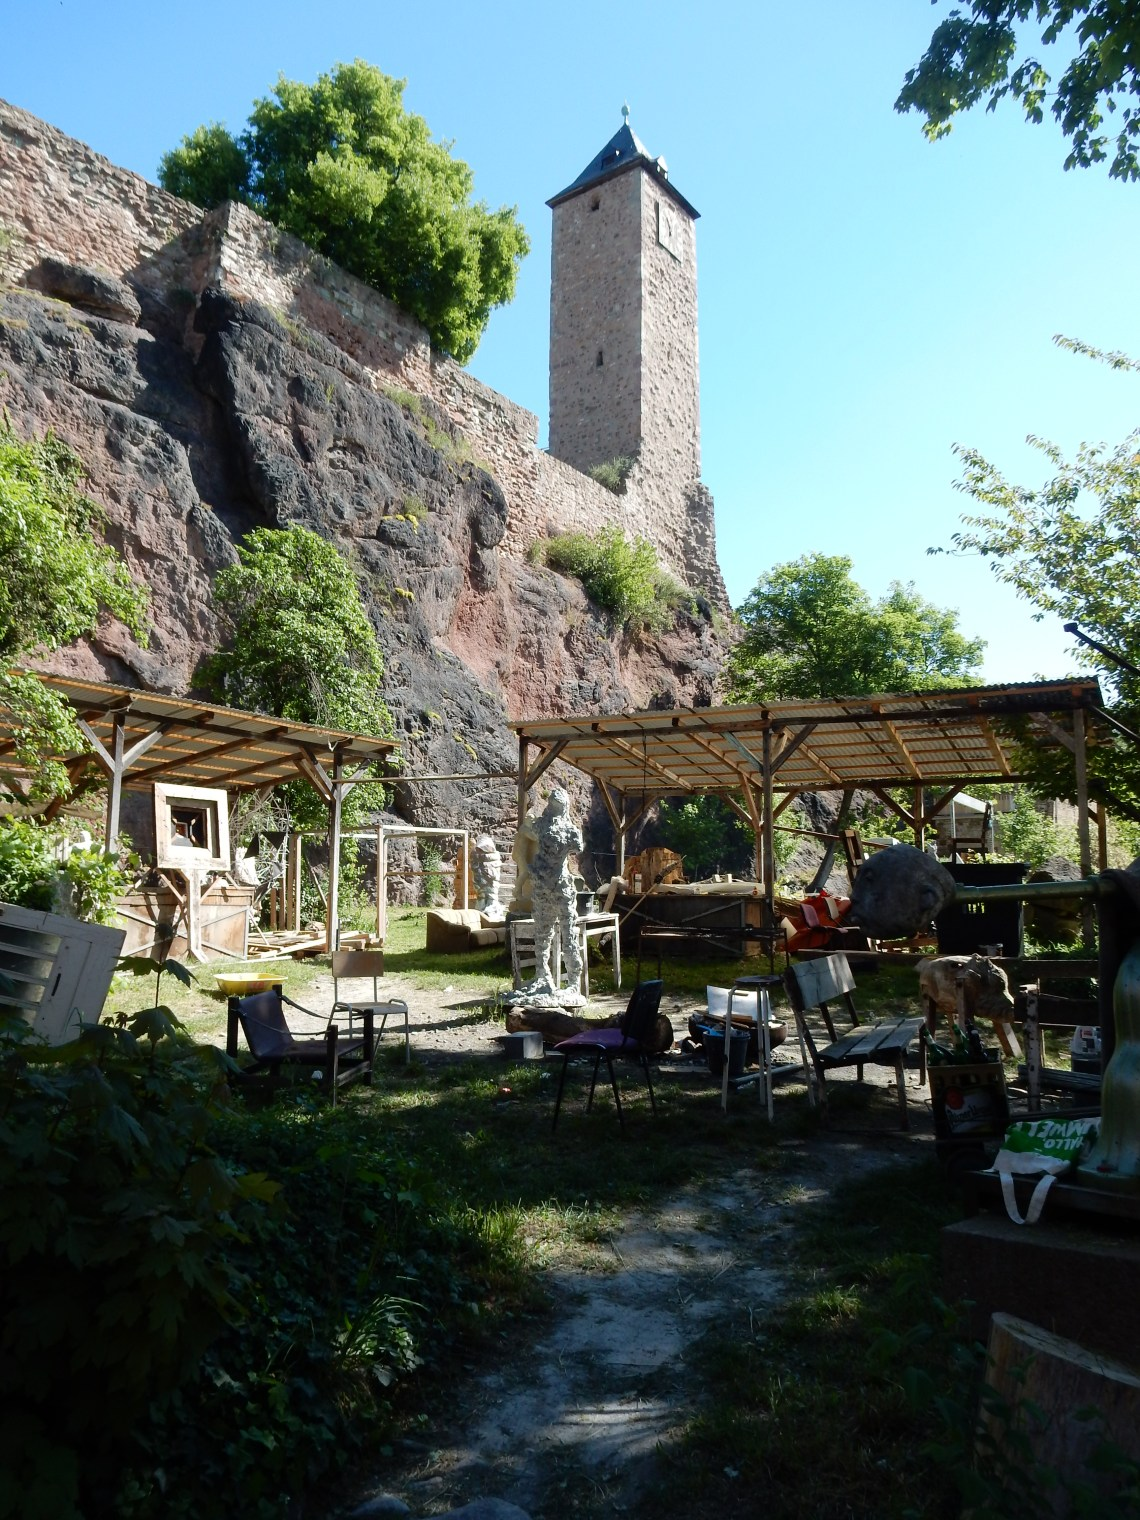 Burg Giebichenstein, mei 2018. Foto met dank aan Coert Peter Krabbe, CC BY 4.0